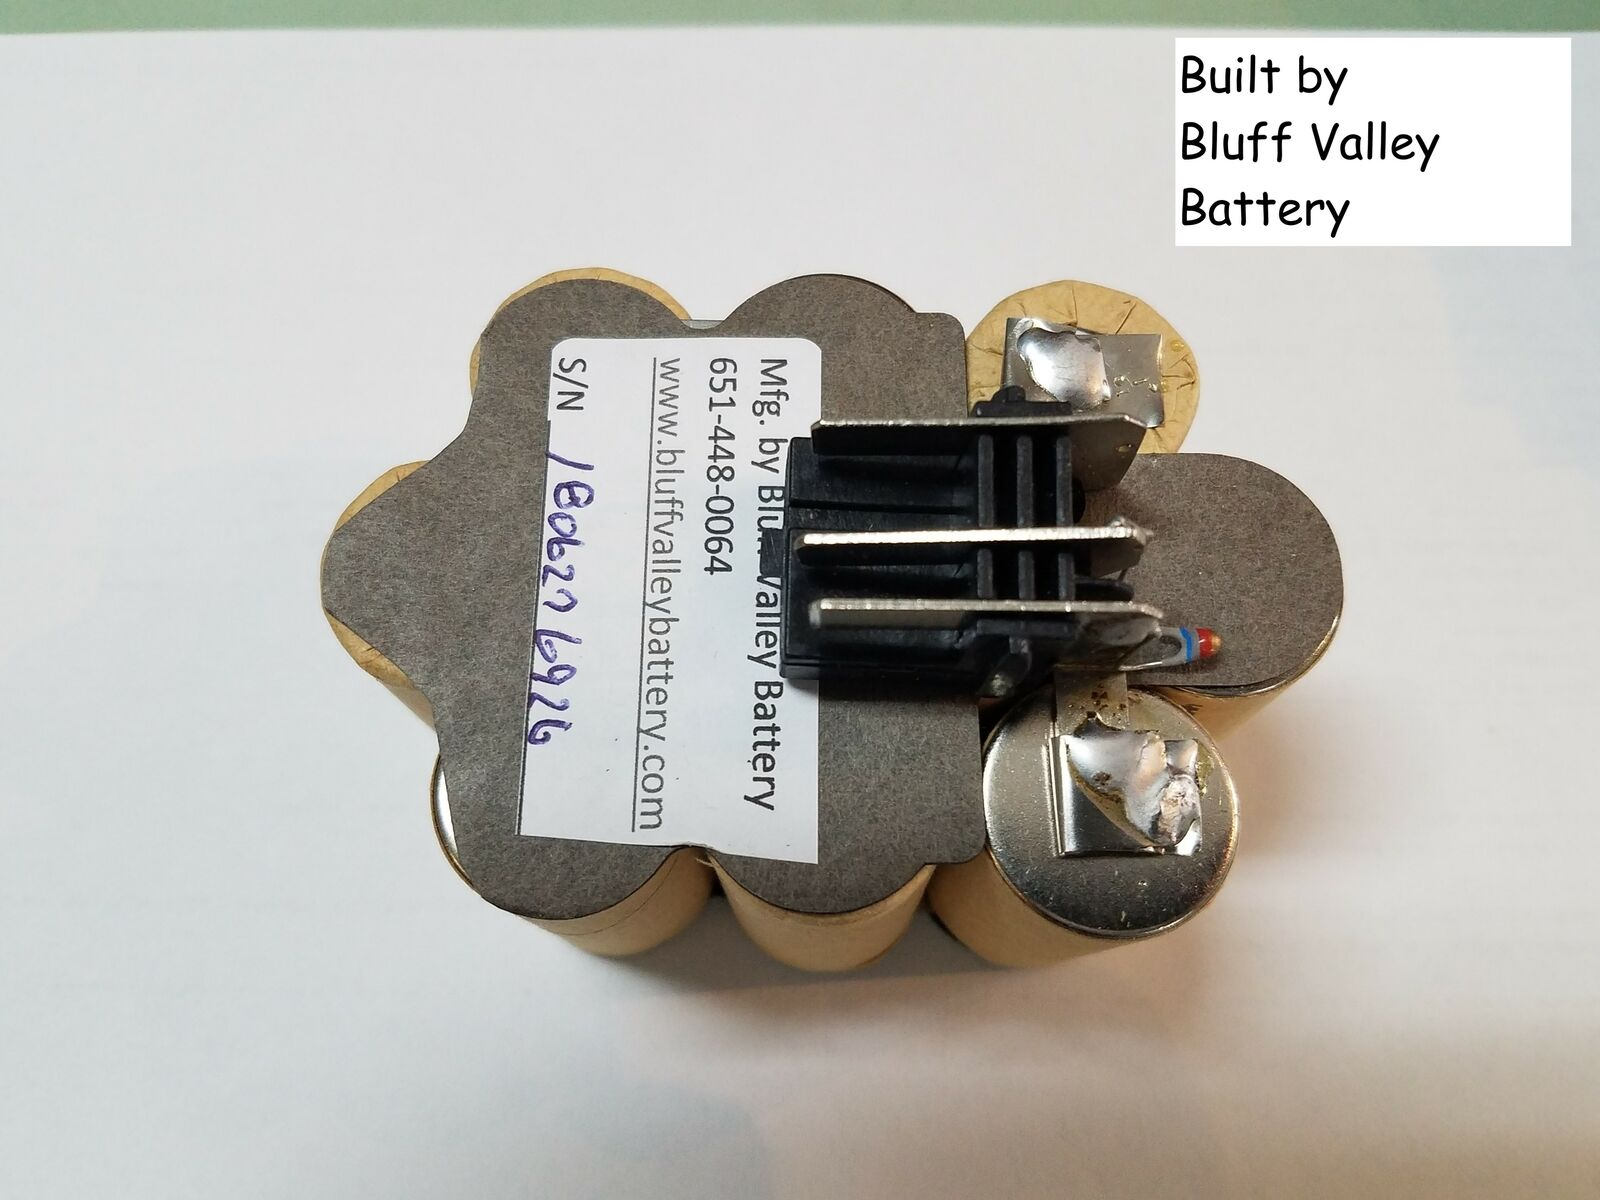 Milwaukee 48-11-1970 12 V 3800 mAh NiMh Battery Rebuild Kit